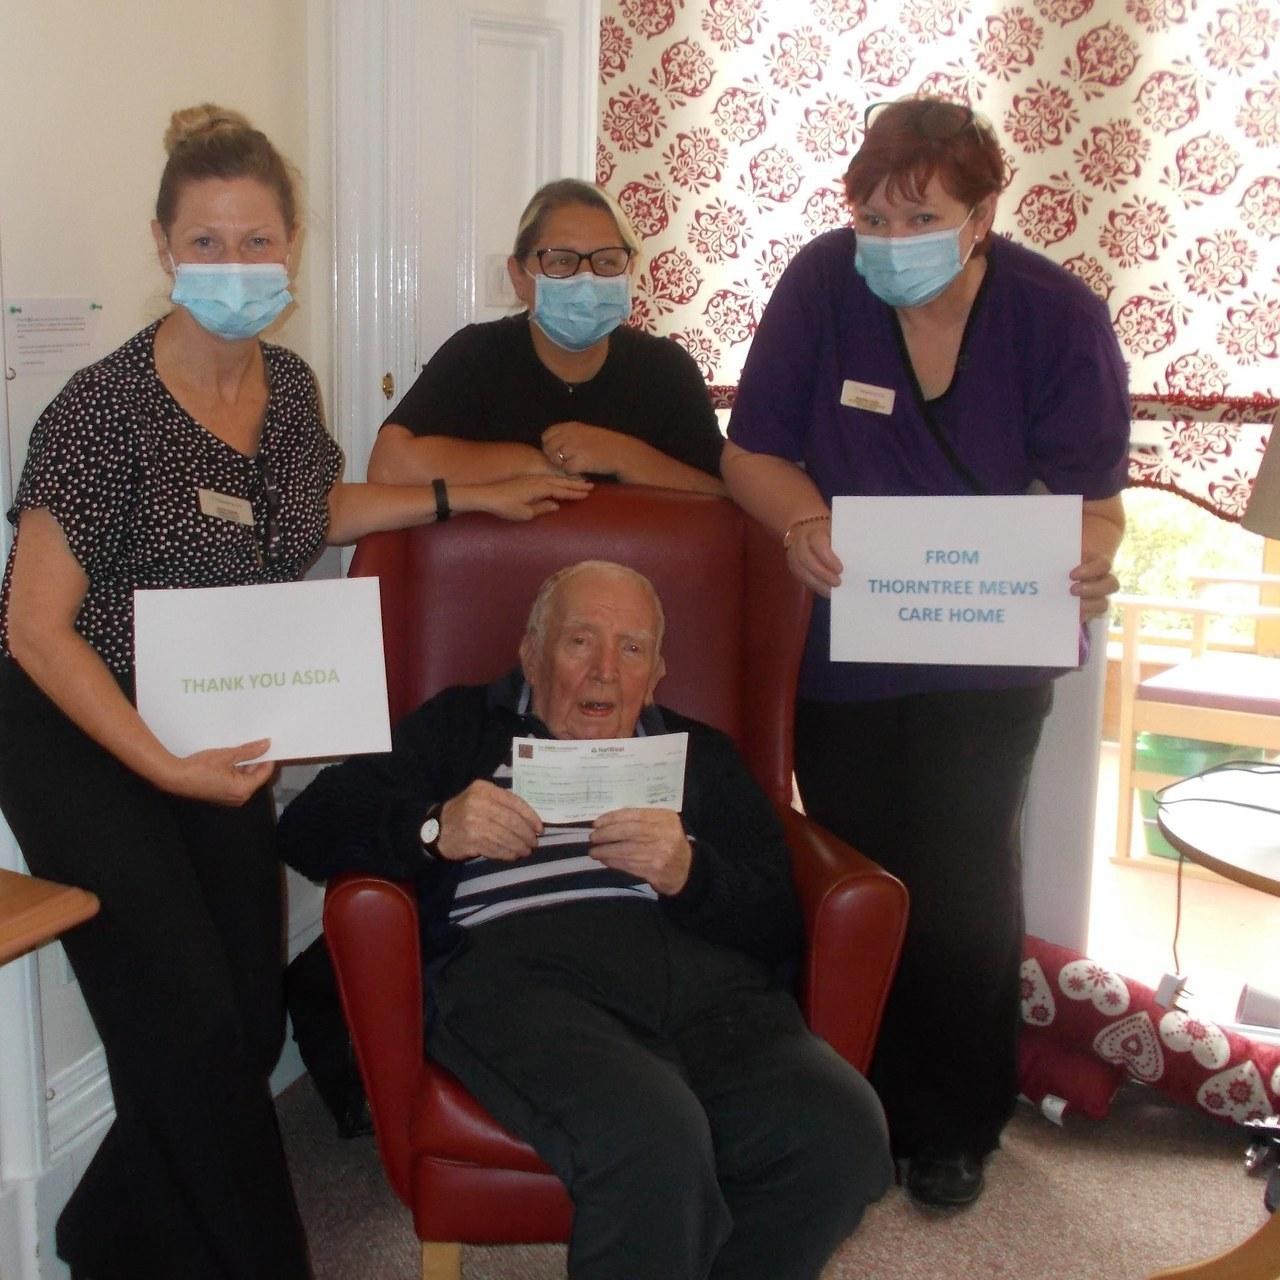 Hygiene grant for care home | Asda Falkirk